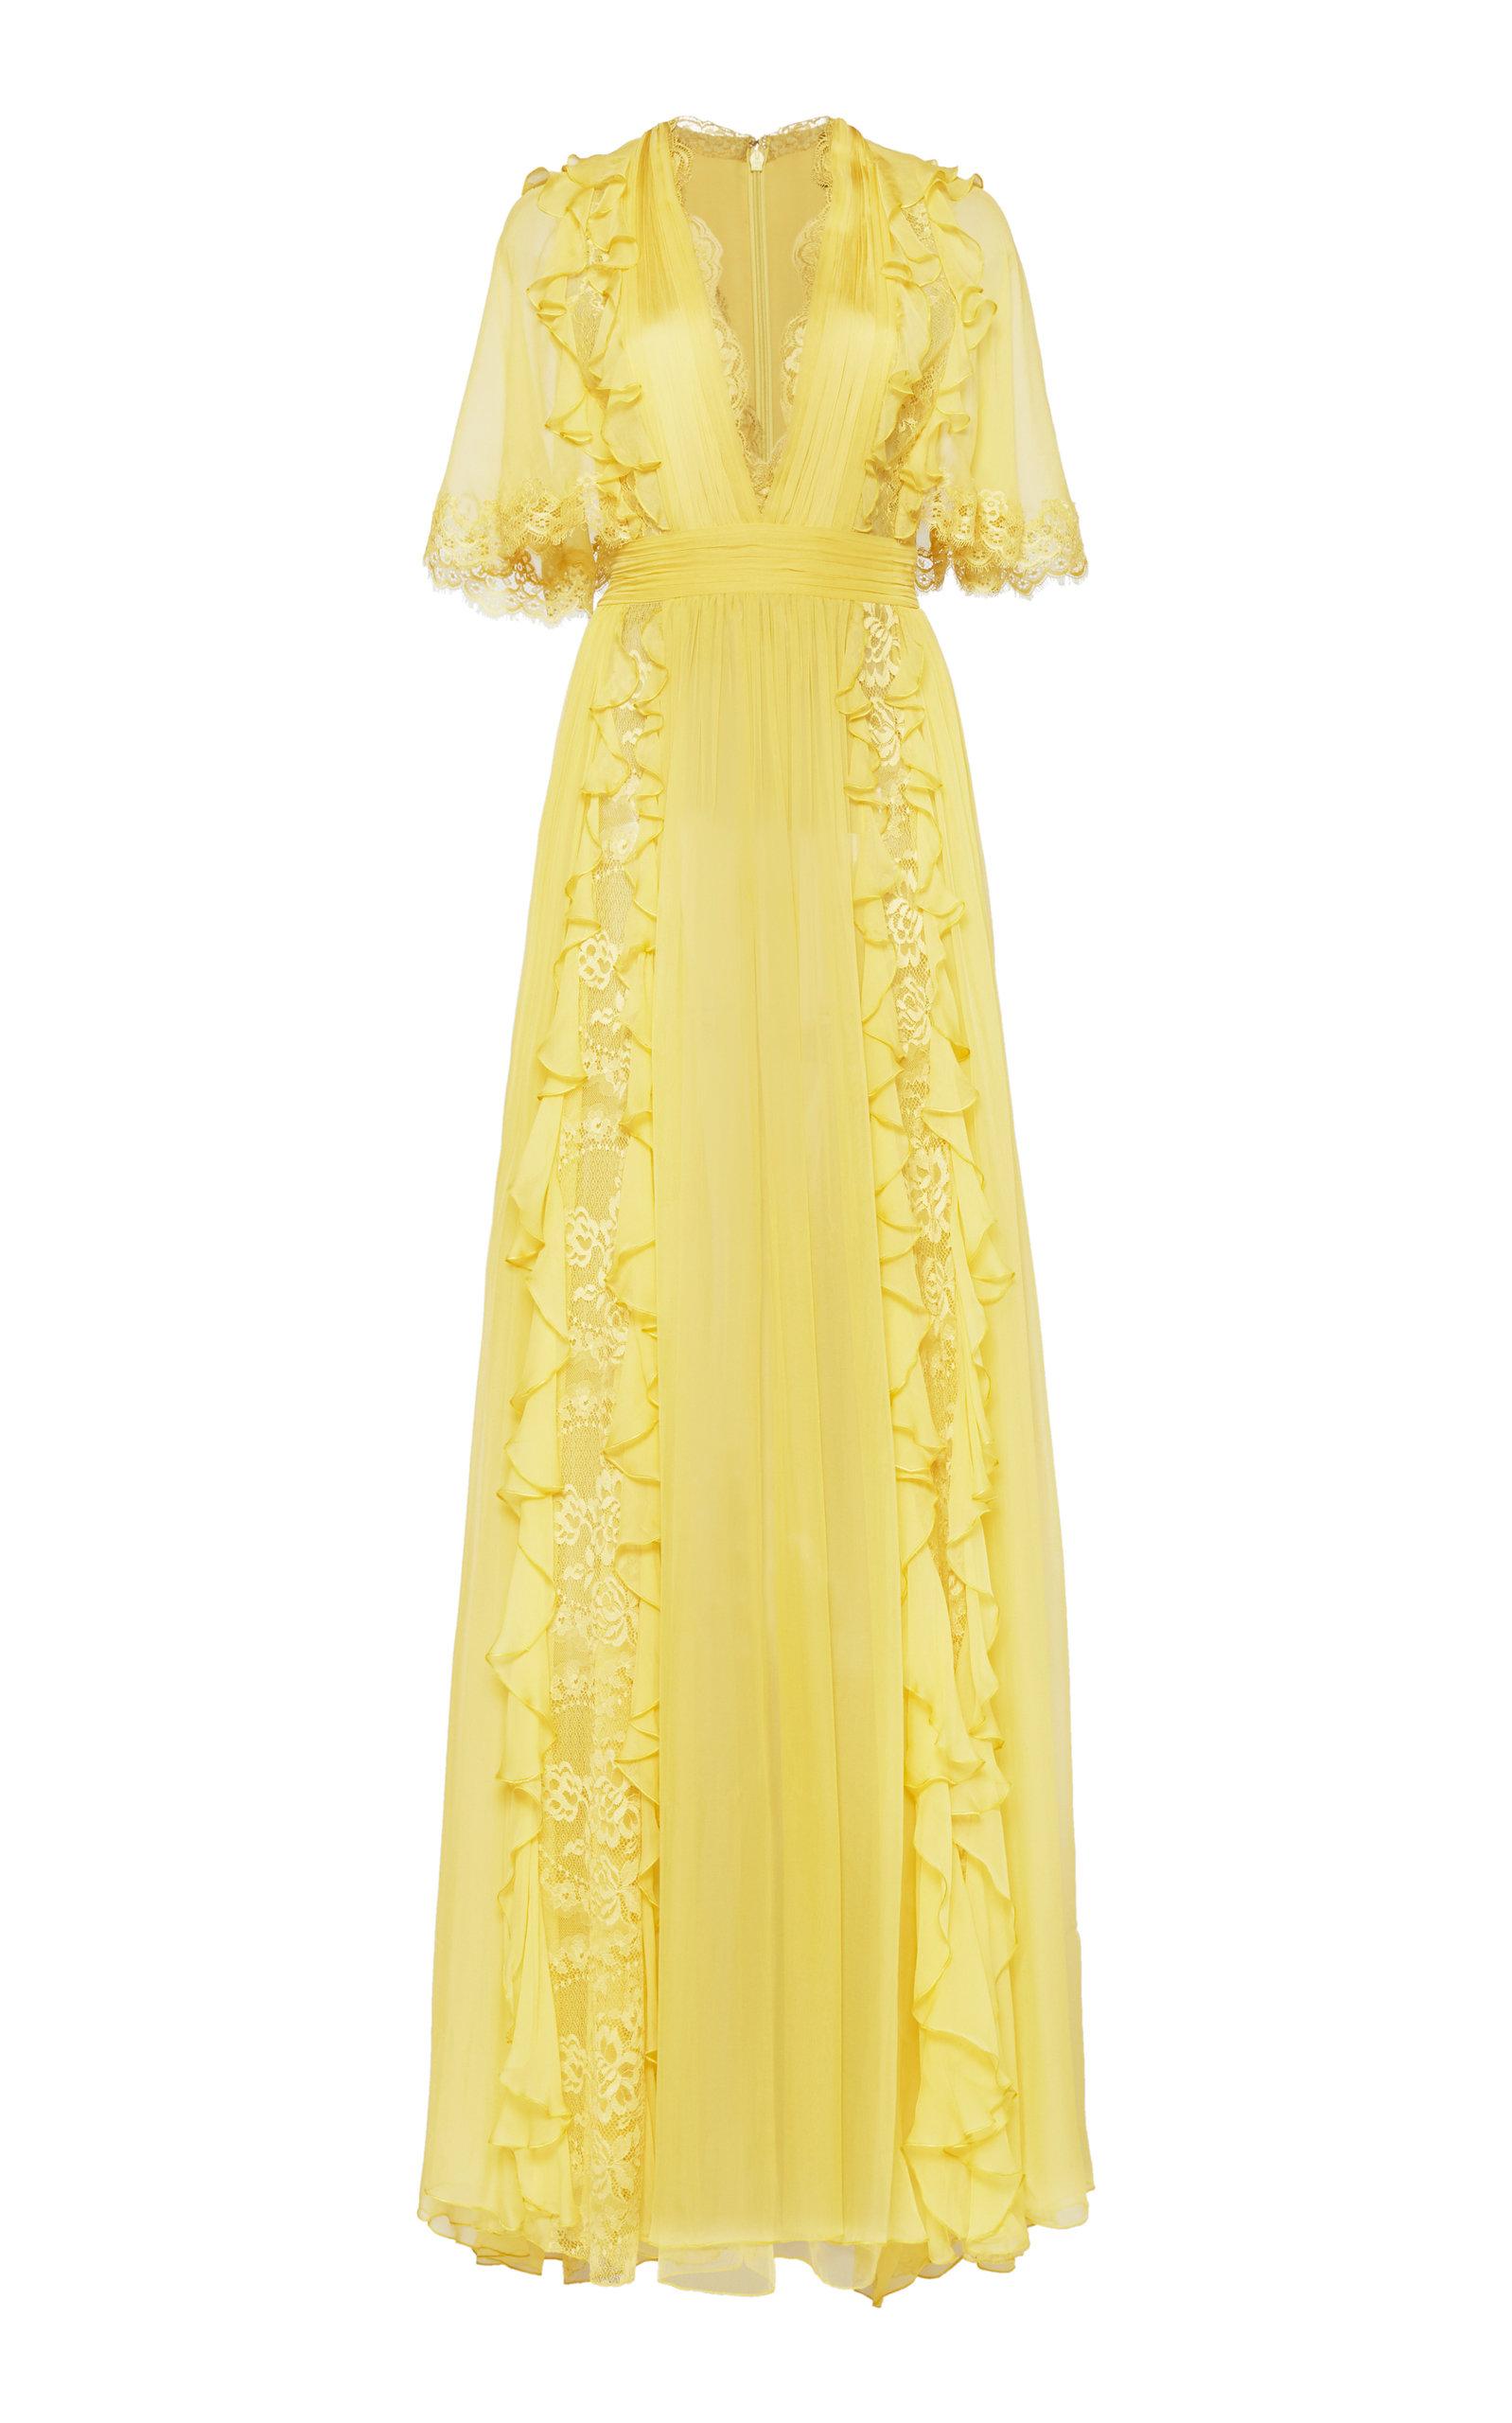 Buy Zuhair Murad Ruffled Lace-Detailed Silk Dress online, shop Zuhair Murad at the best price